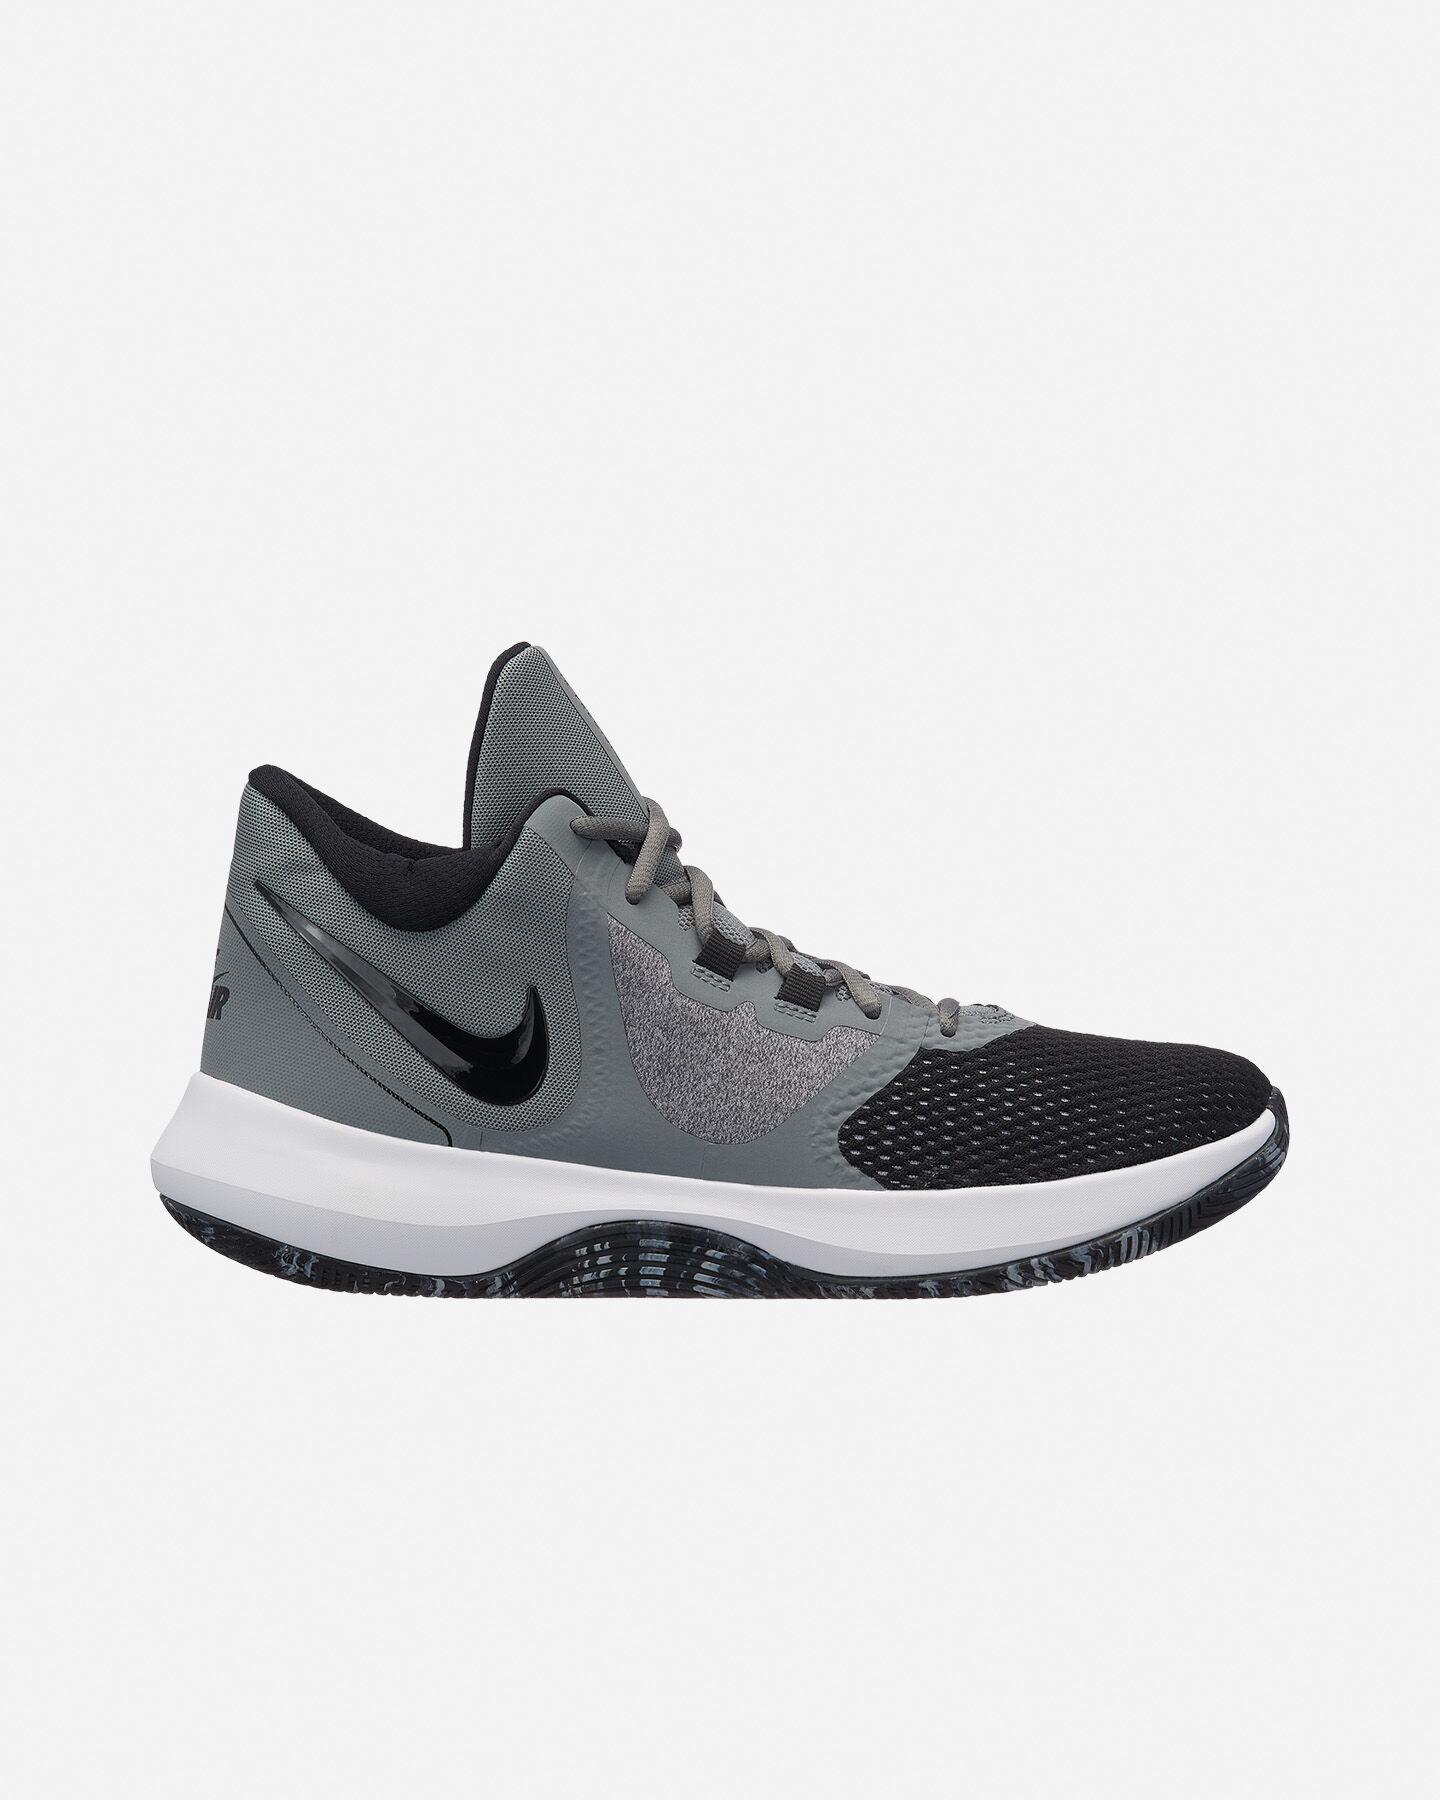 Basket Basket Basket Cisalfa Nike Ii Sport Air Precision 011 Aa7069 Scarpe Su M   314645